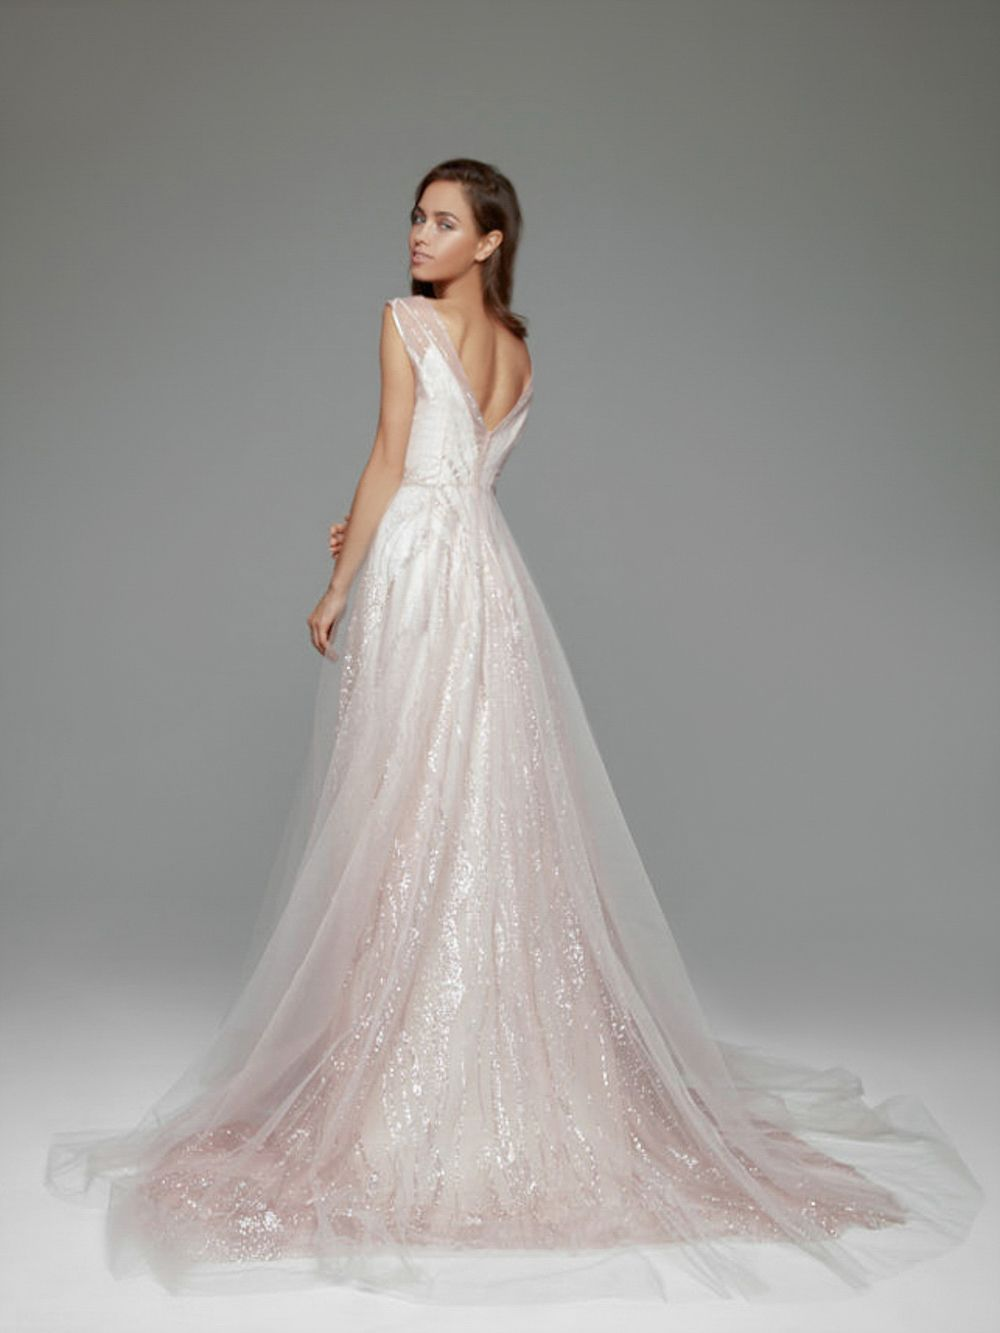 Non White Wedding Dresses For Non Traditional Brides Sacramento Wedding Dresses Miosa Bride